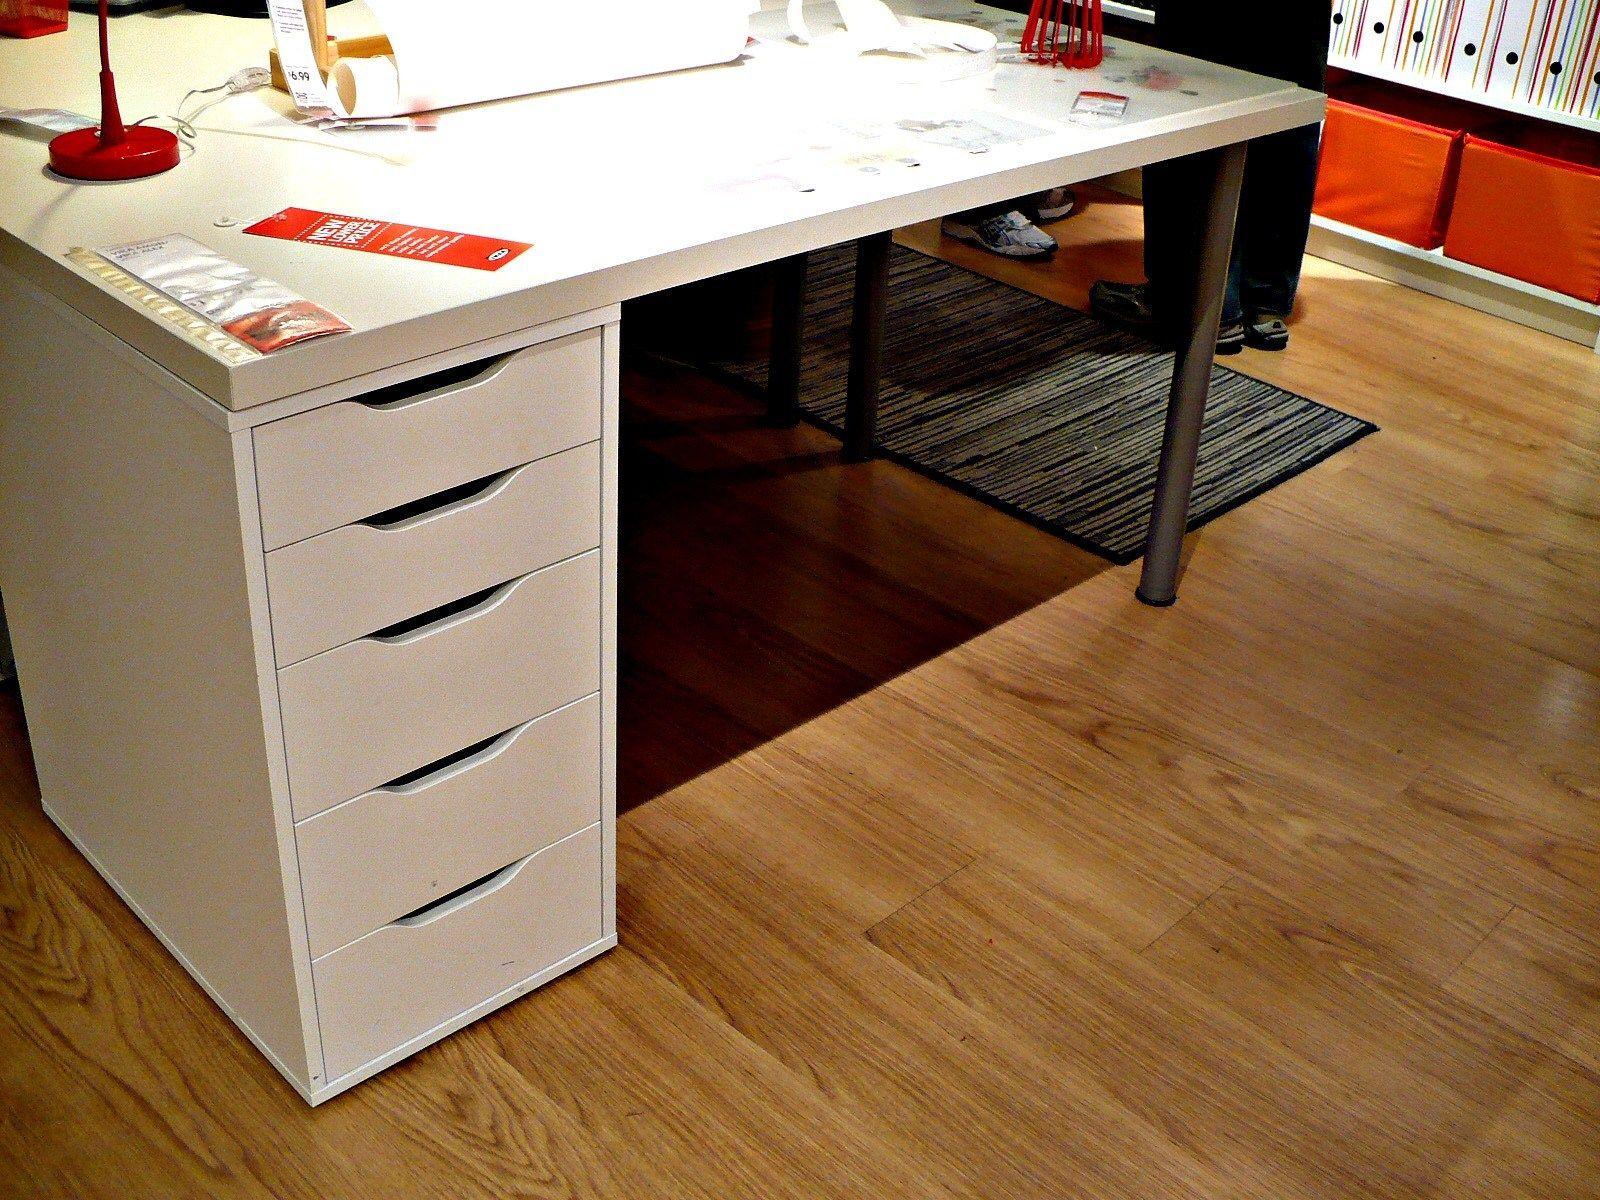 Ikea Office Cabinet Home Office Design Interior Design Furniture Ikea Office Cabinets